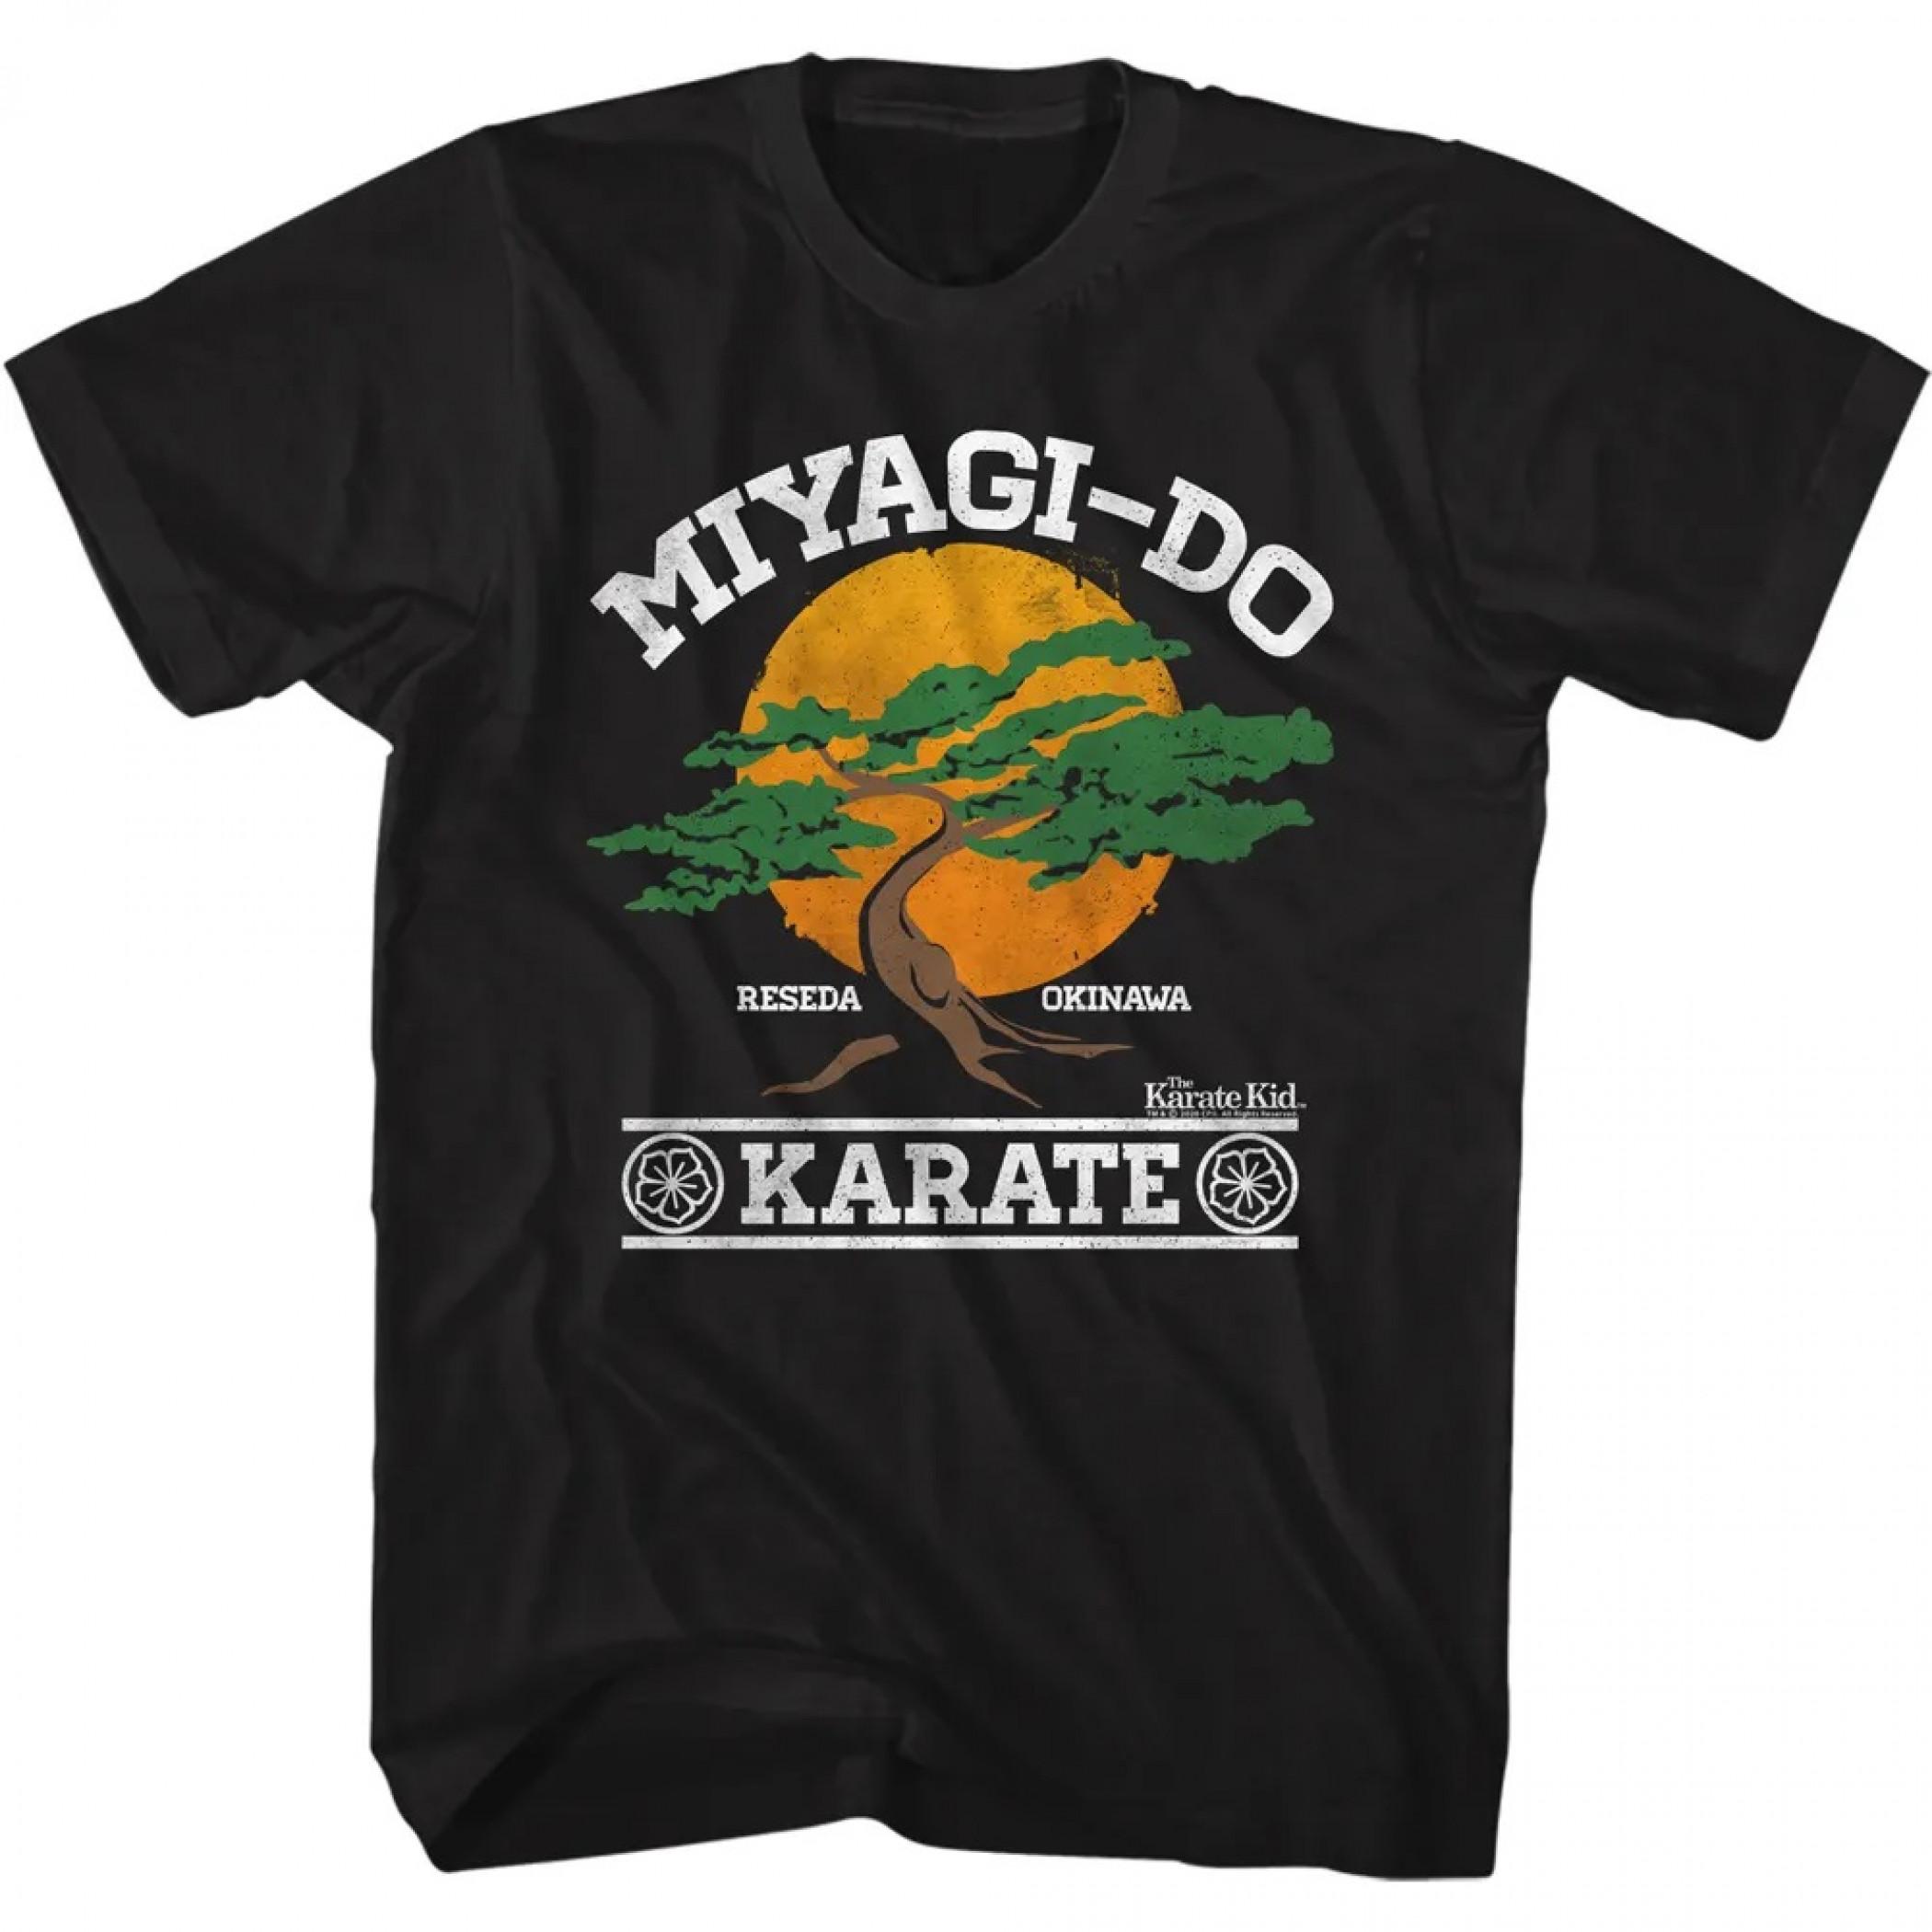 The Karate Kid Miyagi-Do Karate T-Shirt